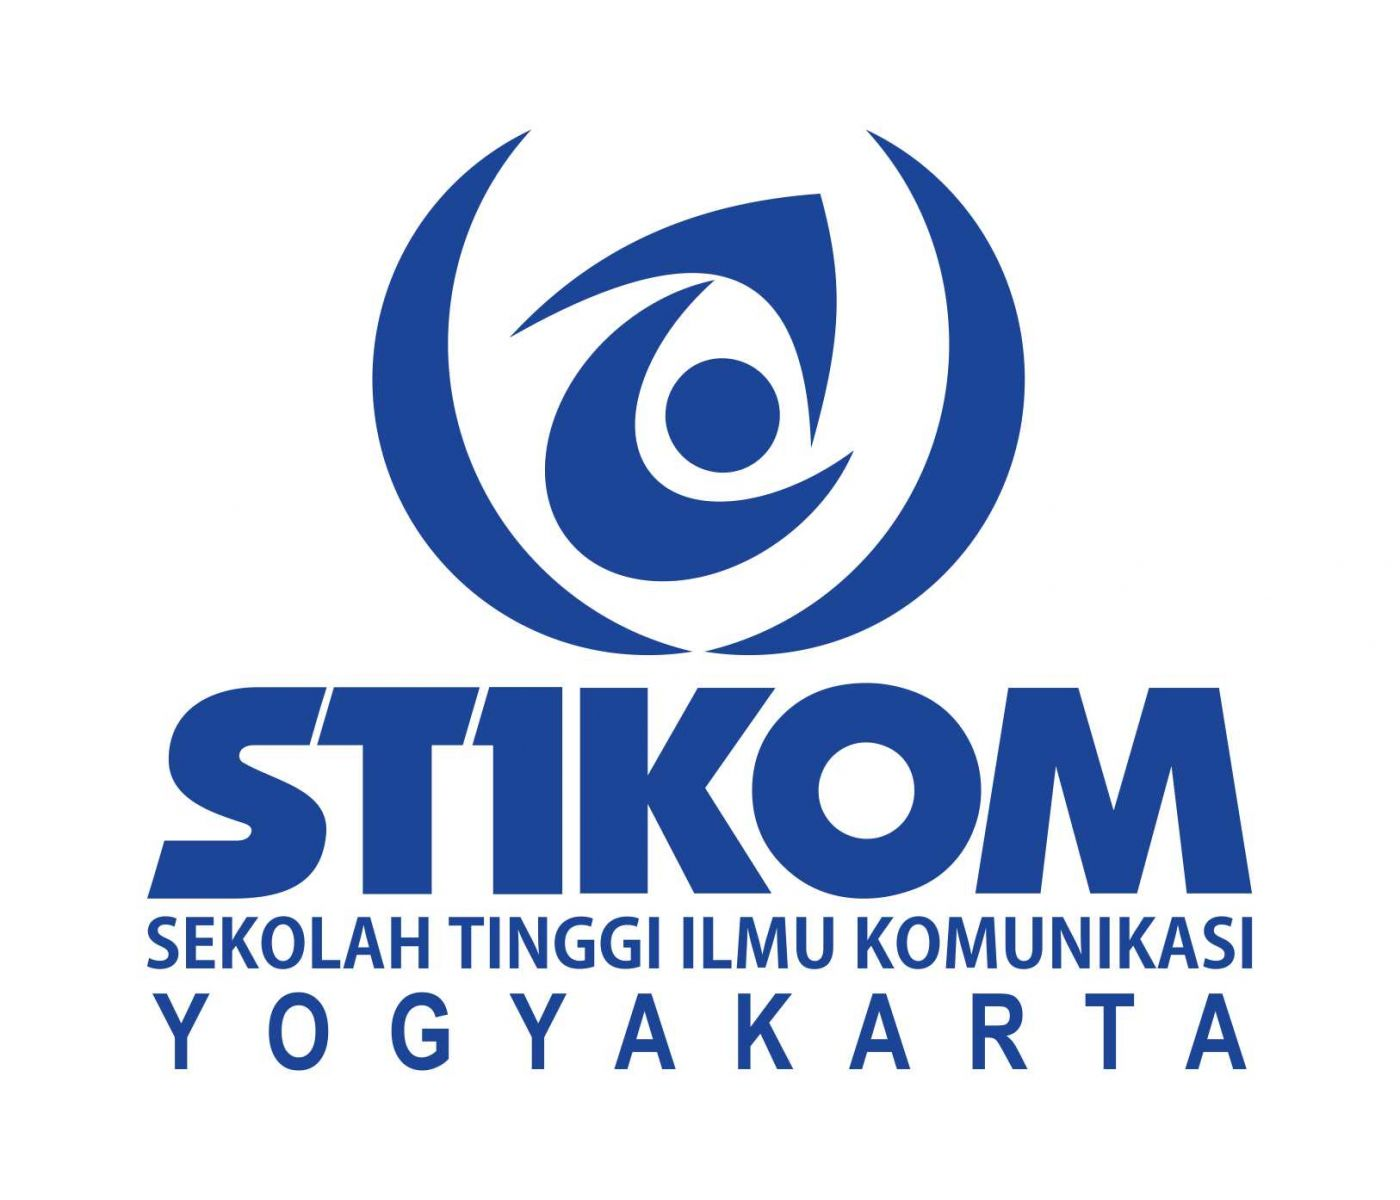 Daftar Mata Kuliah Semester Ganjil STIKOM Yogyakarta